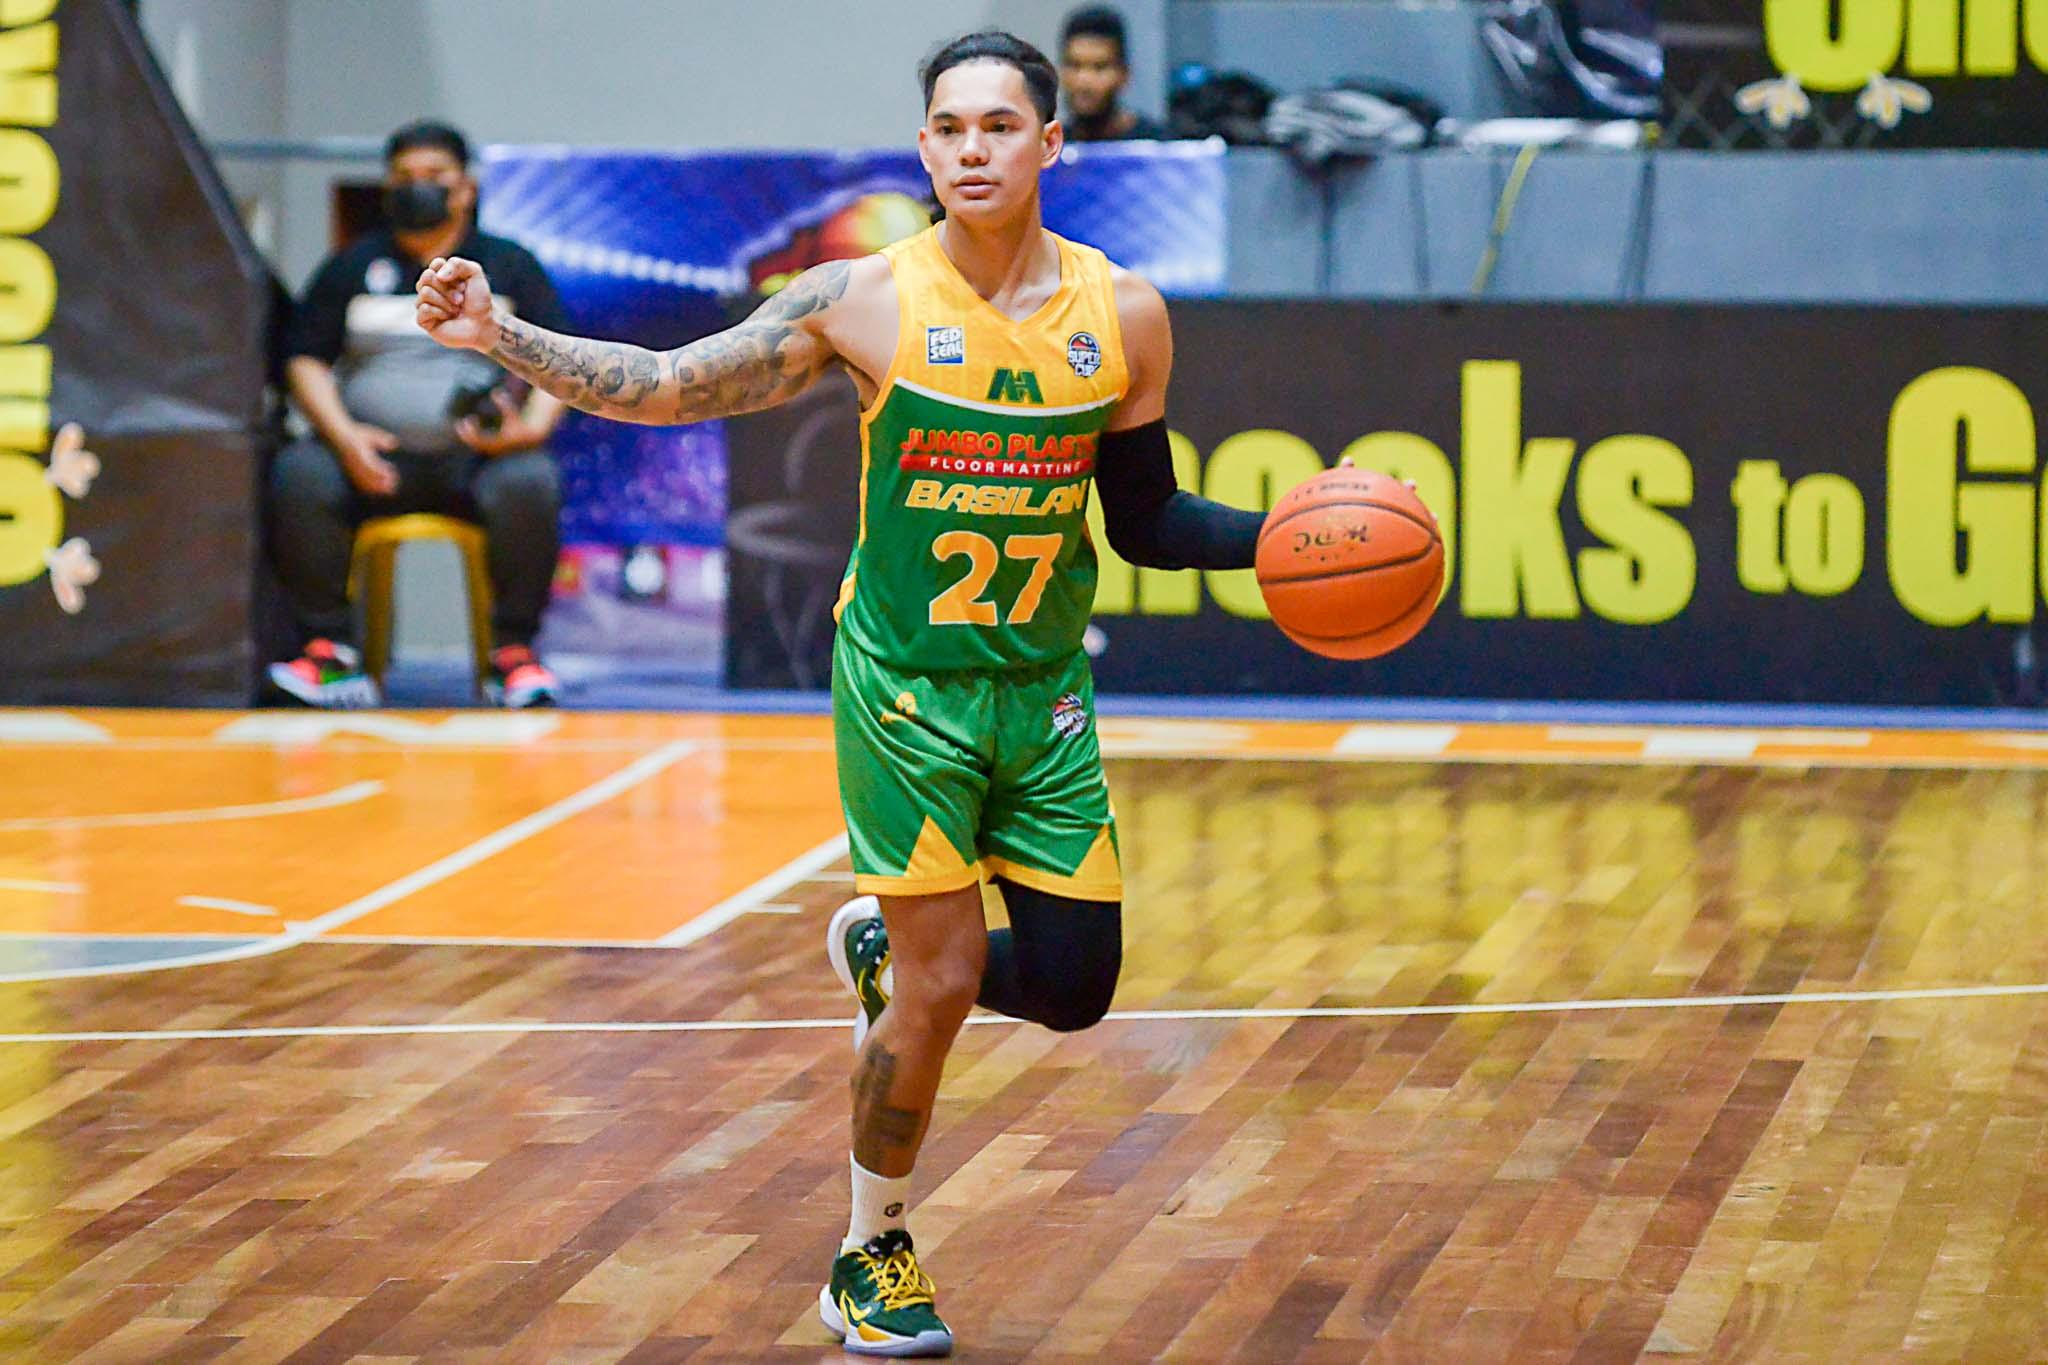 2021-Chooks-VisMin-Mindanao-Finals-Roxas-vs-Basilan-Chris-Bitoon-2 Bitoon's sacrifice pays off with VisMin Finals MVP plum Basketball News VisMin Super Cup  - philippine sports news